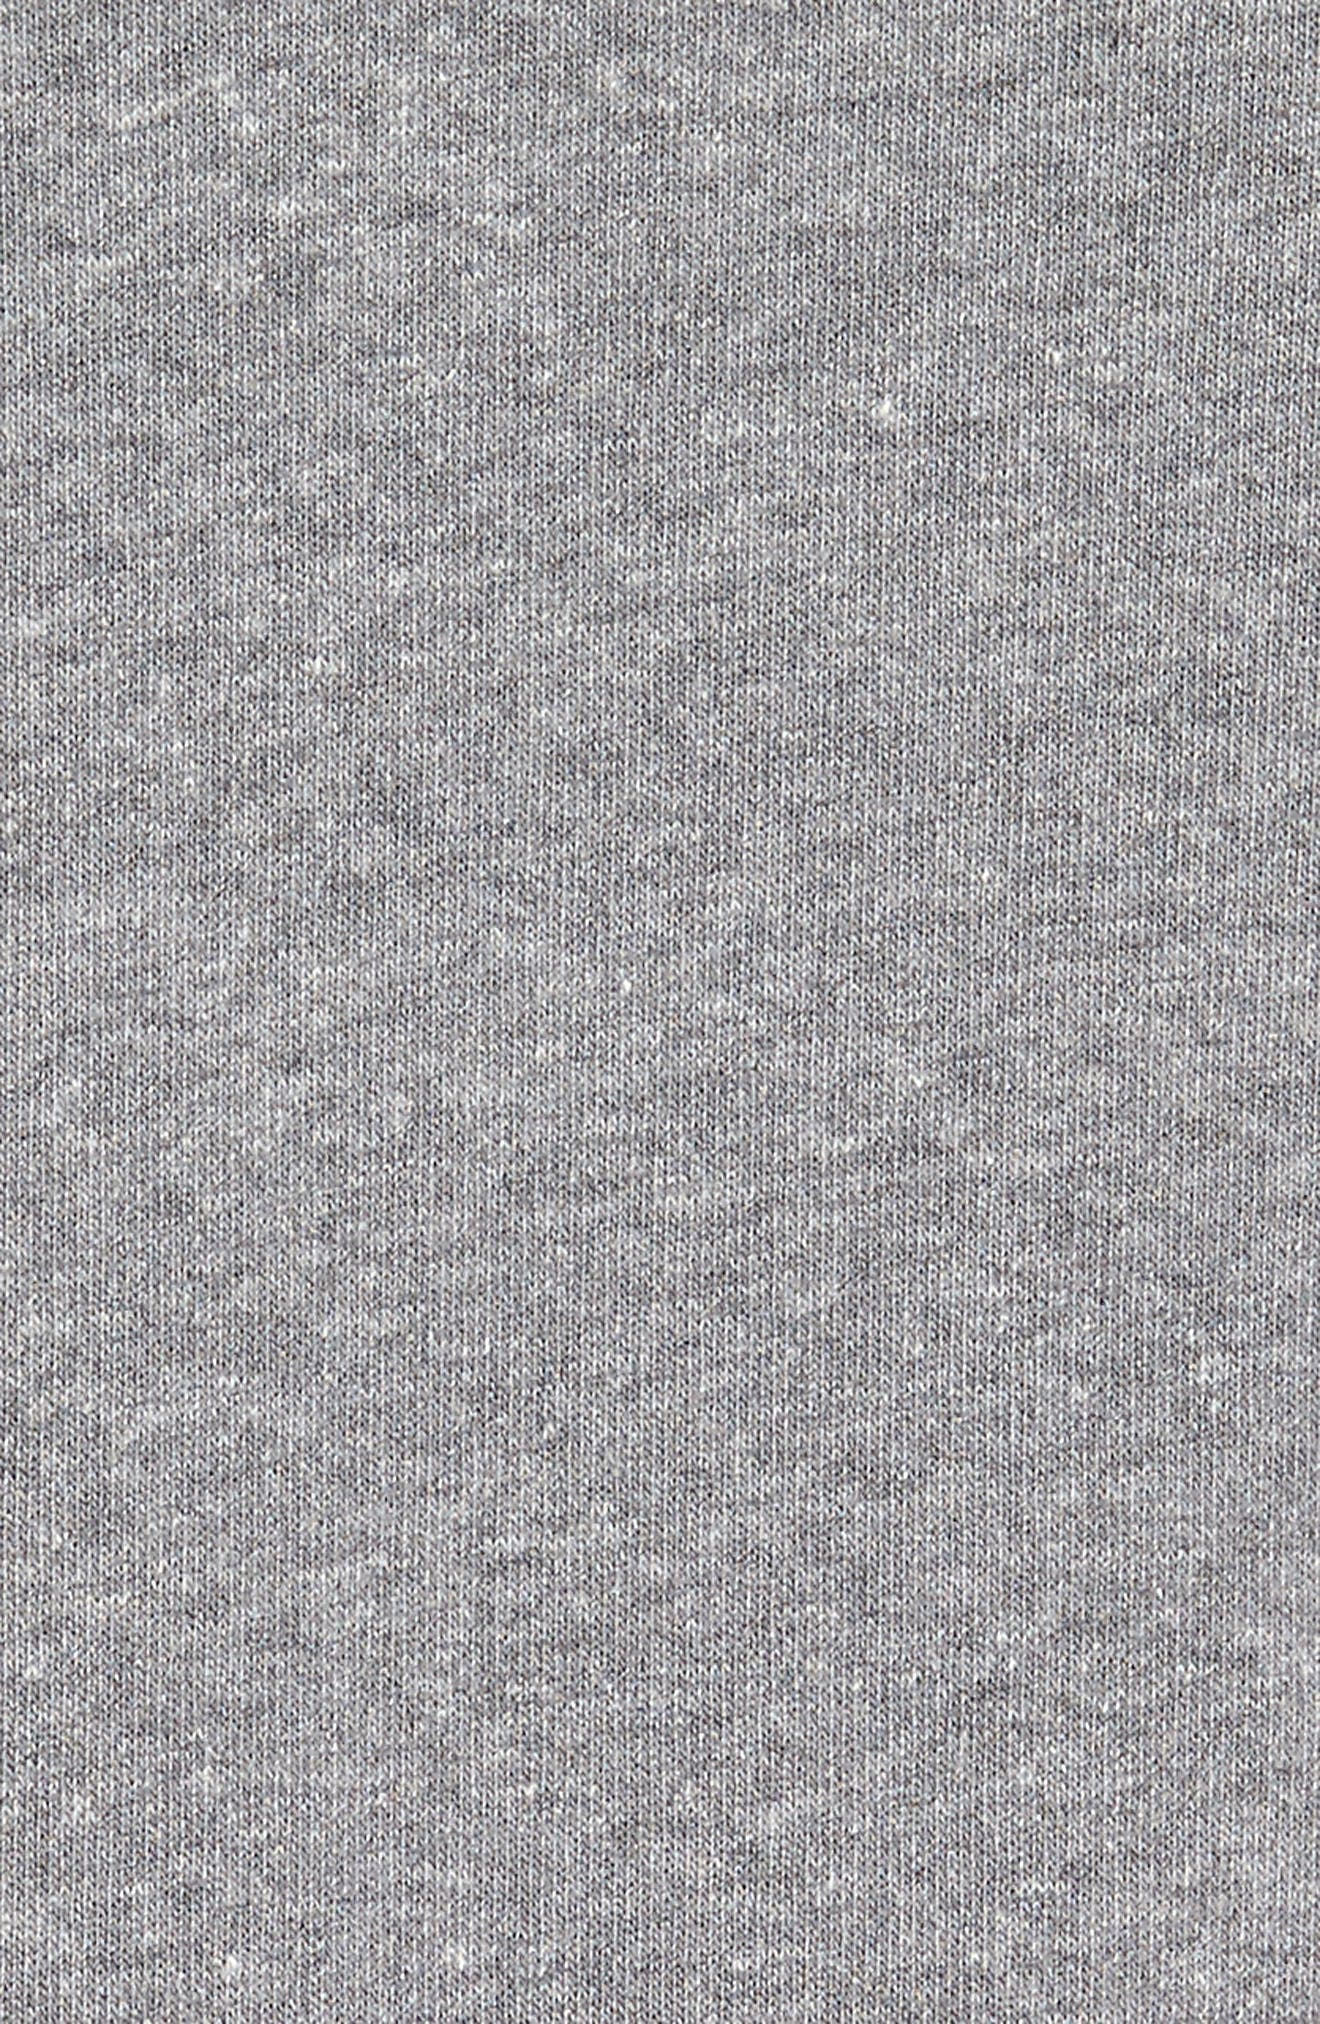 'The Champ' Sweatshirt,                             Alternate thumbnail 62, color,